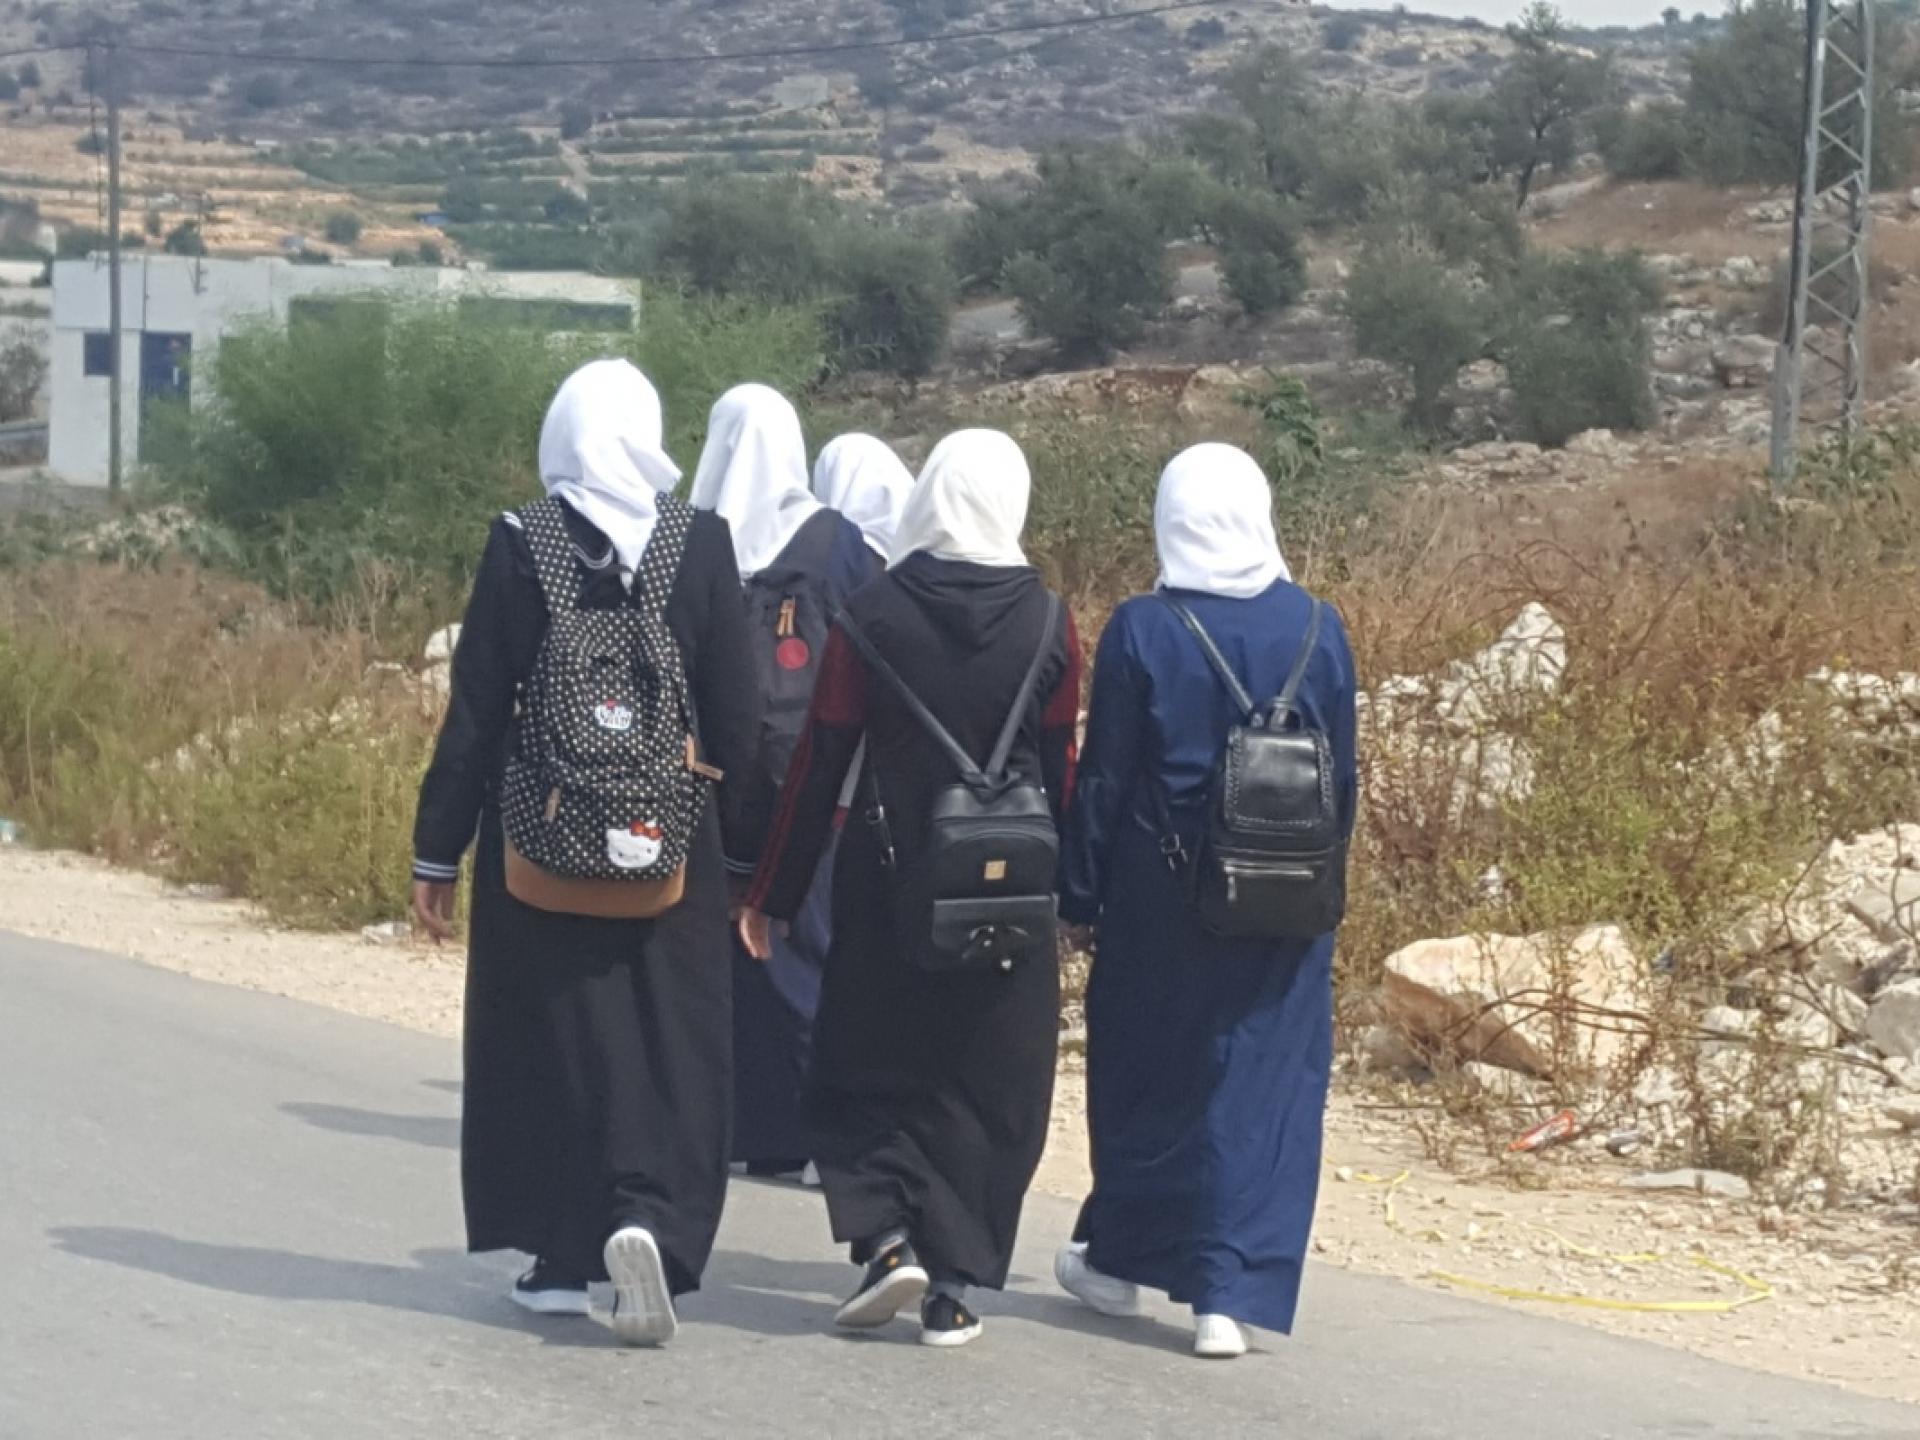 Schoolgirls on their way home